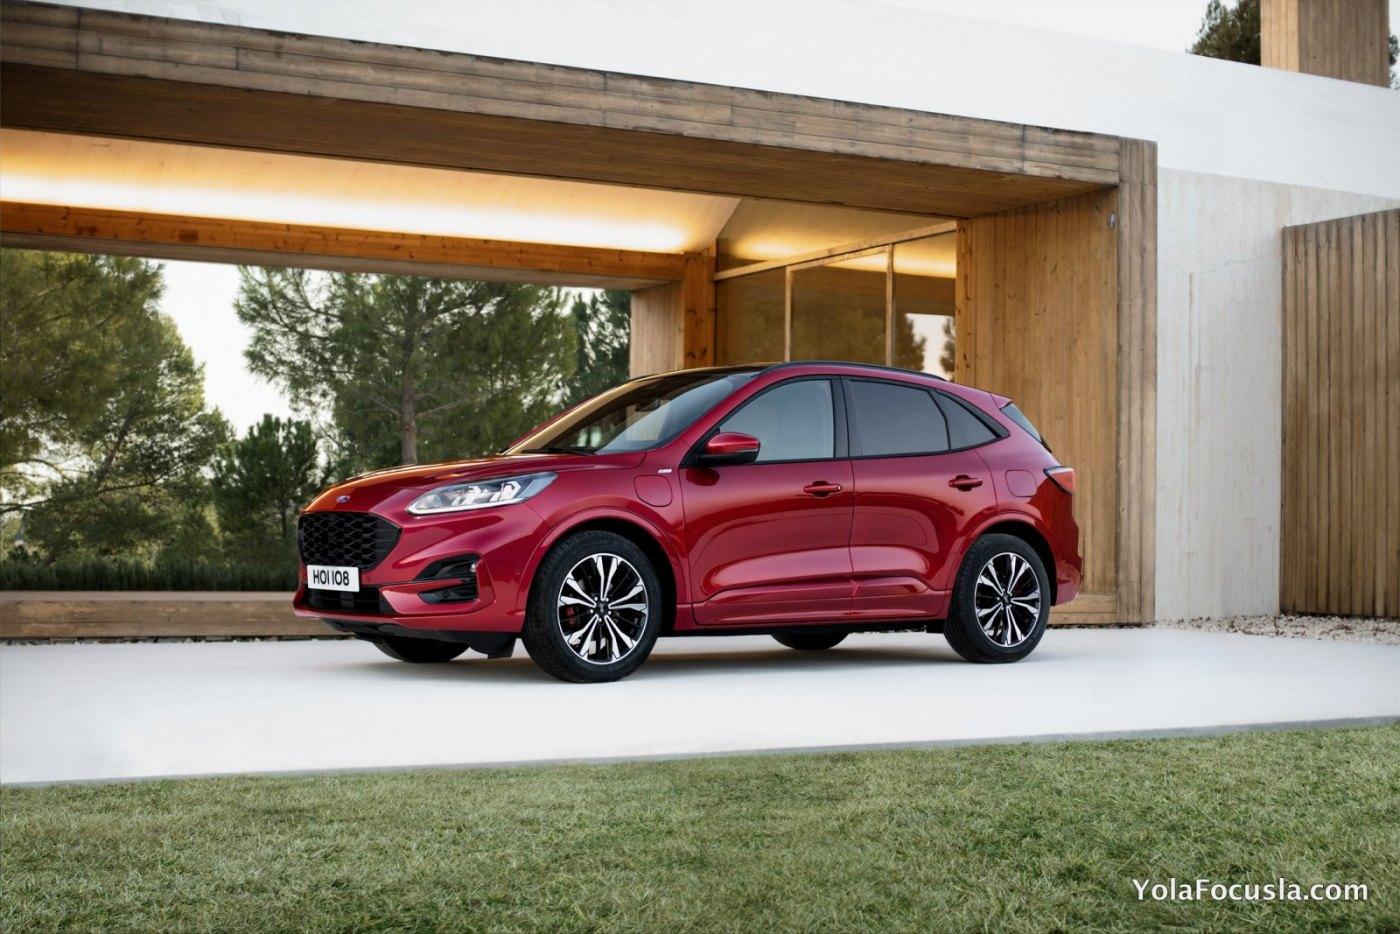 2019 Ford Kuga_5.jpg